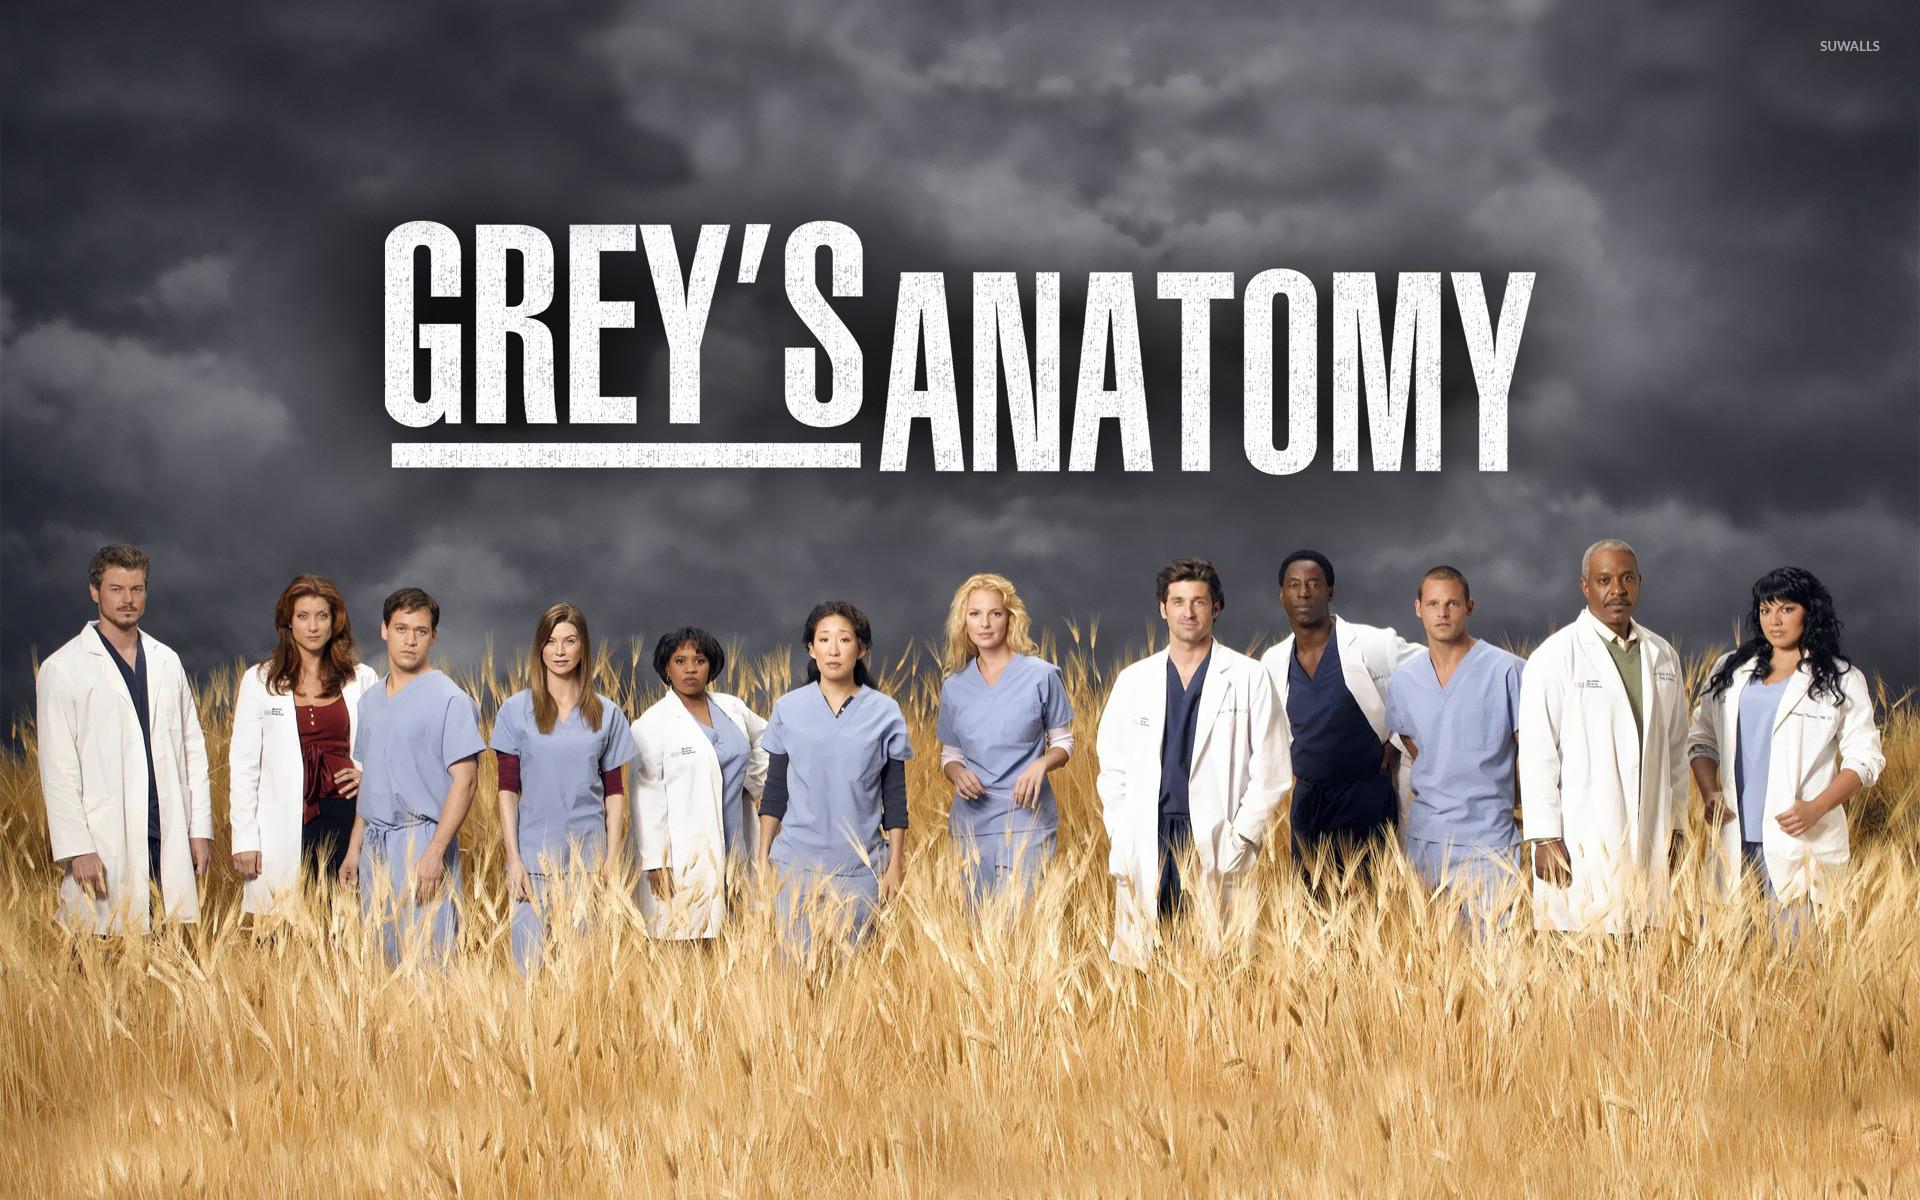 Greys Anatomy Wallpapers ·①